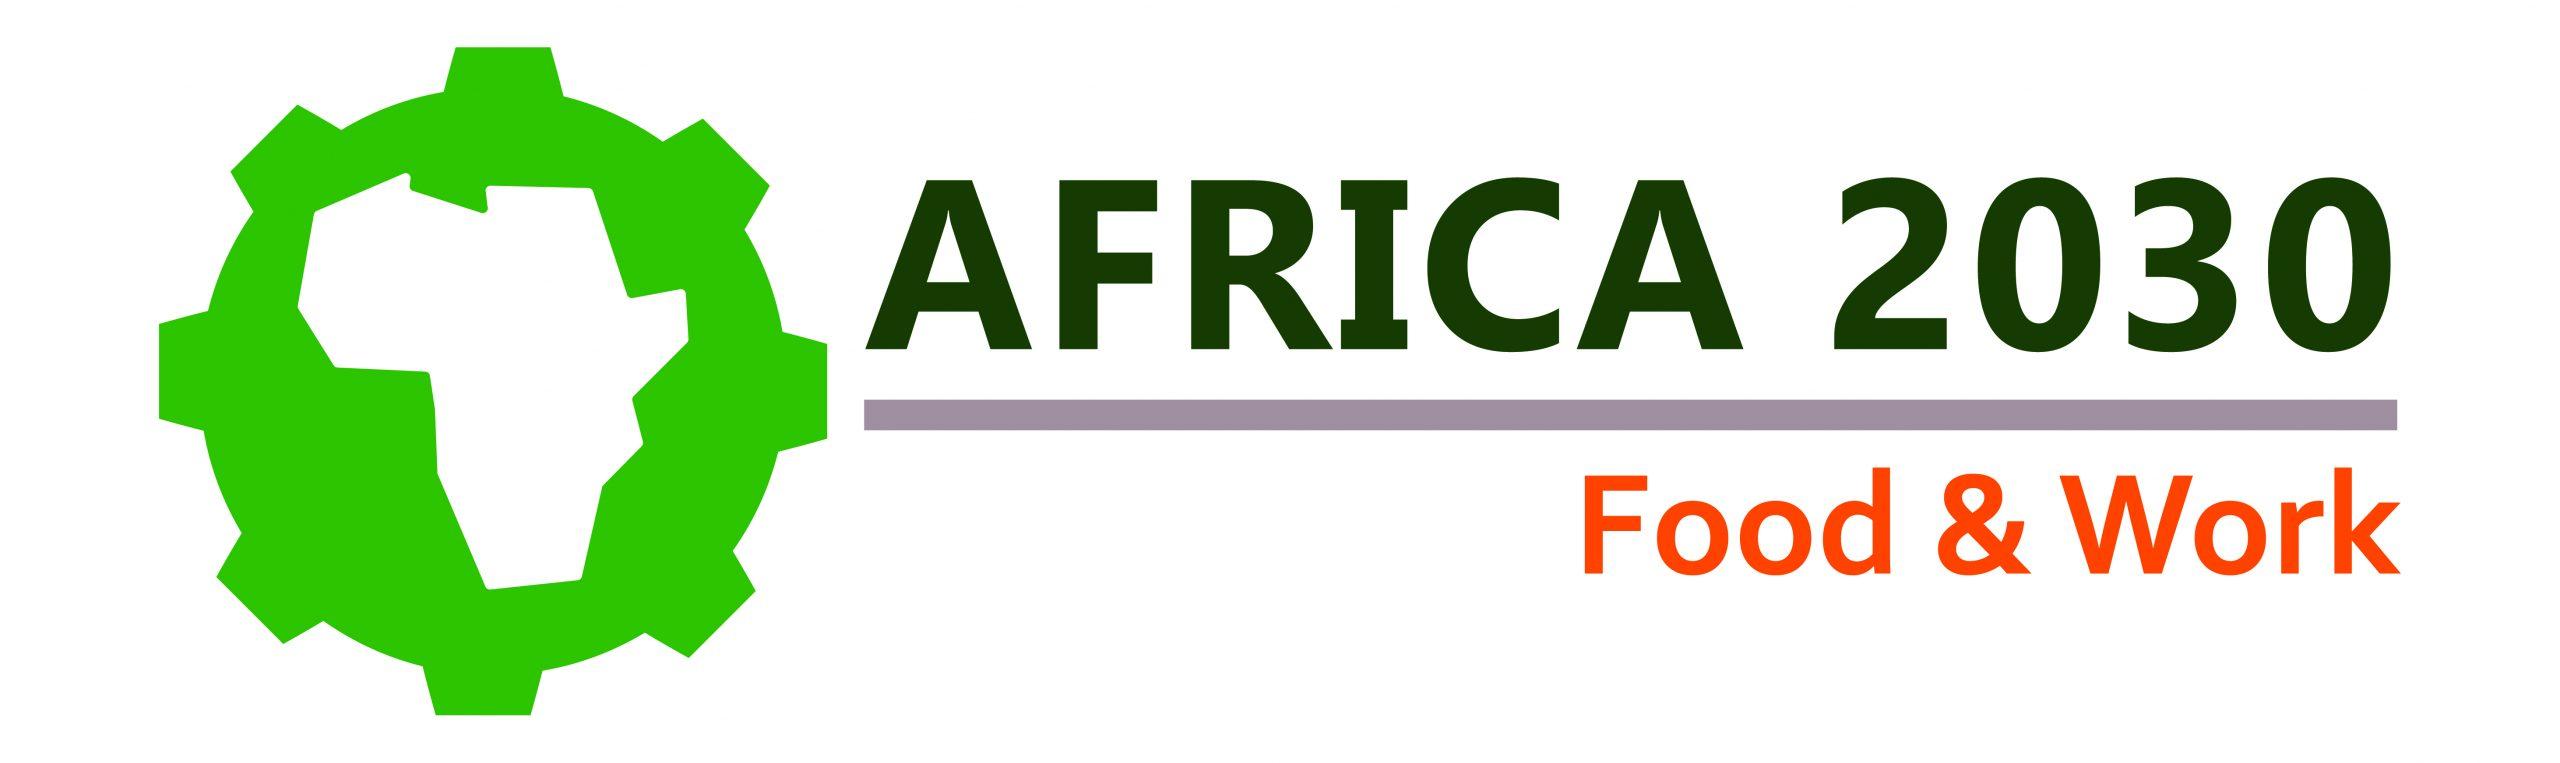 https://viceversaonline.nl/site/wp-content/uploads/2020/09/Africa-2030-color-jpg-scaled.jpg